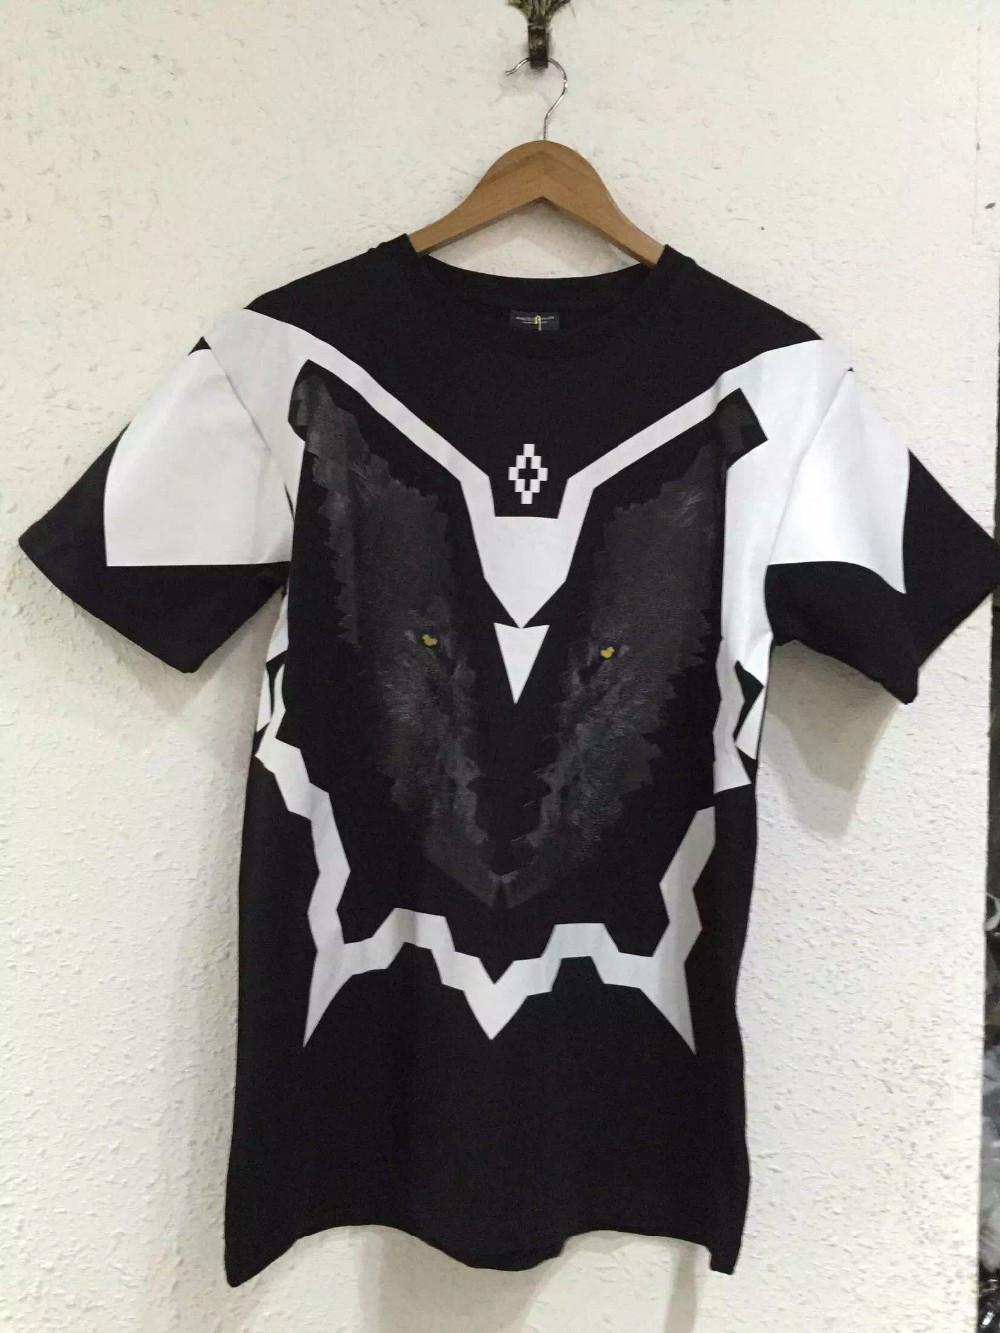 2015 new summer tide style MARCELO BURLON top tees Snowy Wolf print men / women cotton fashion Short sleeve t-shirt High quality(China (Mainland))